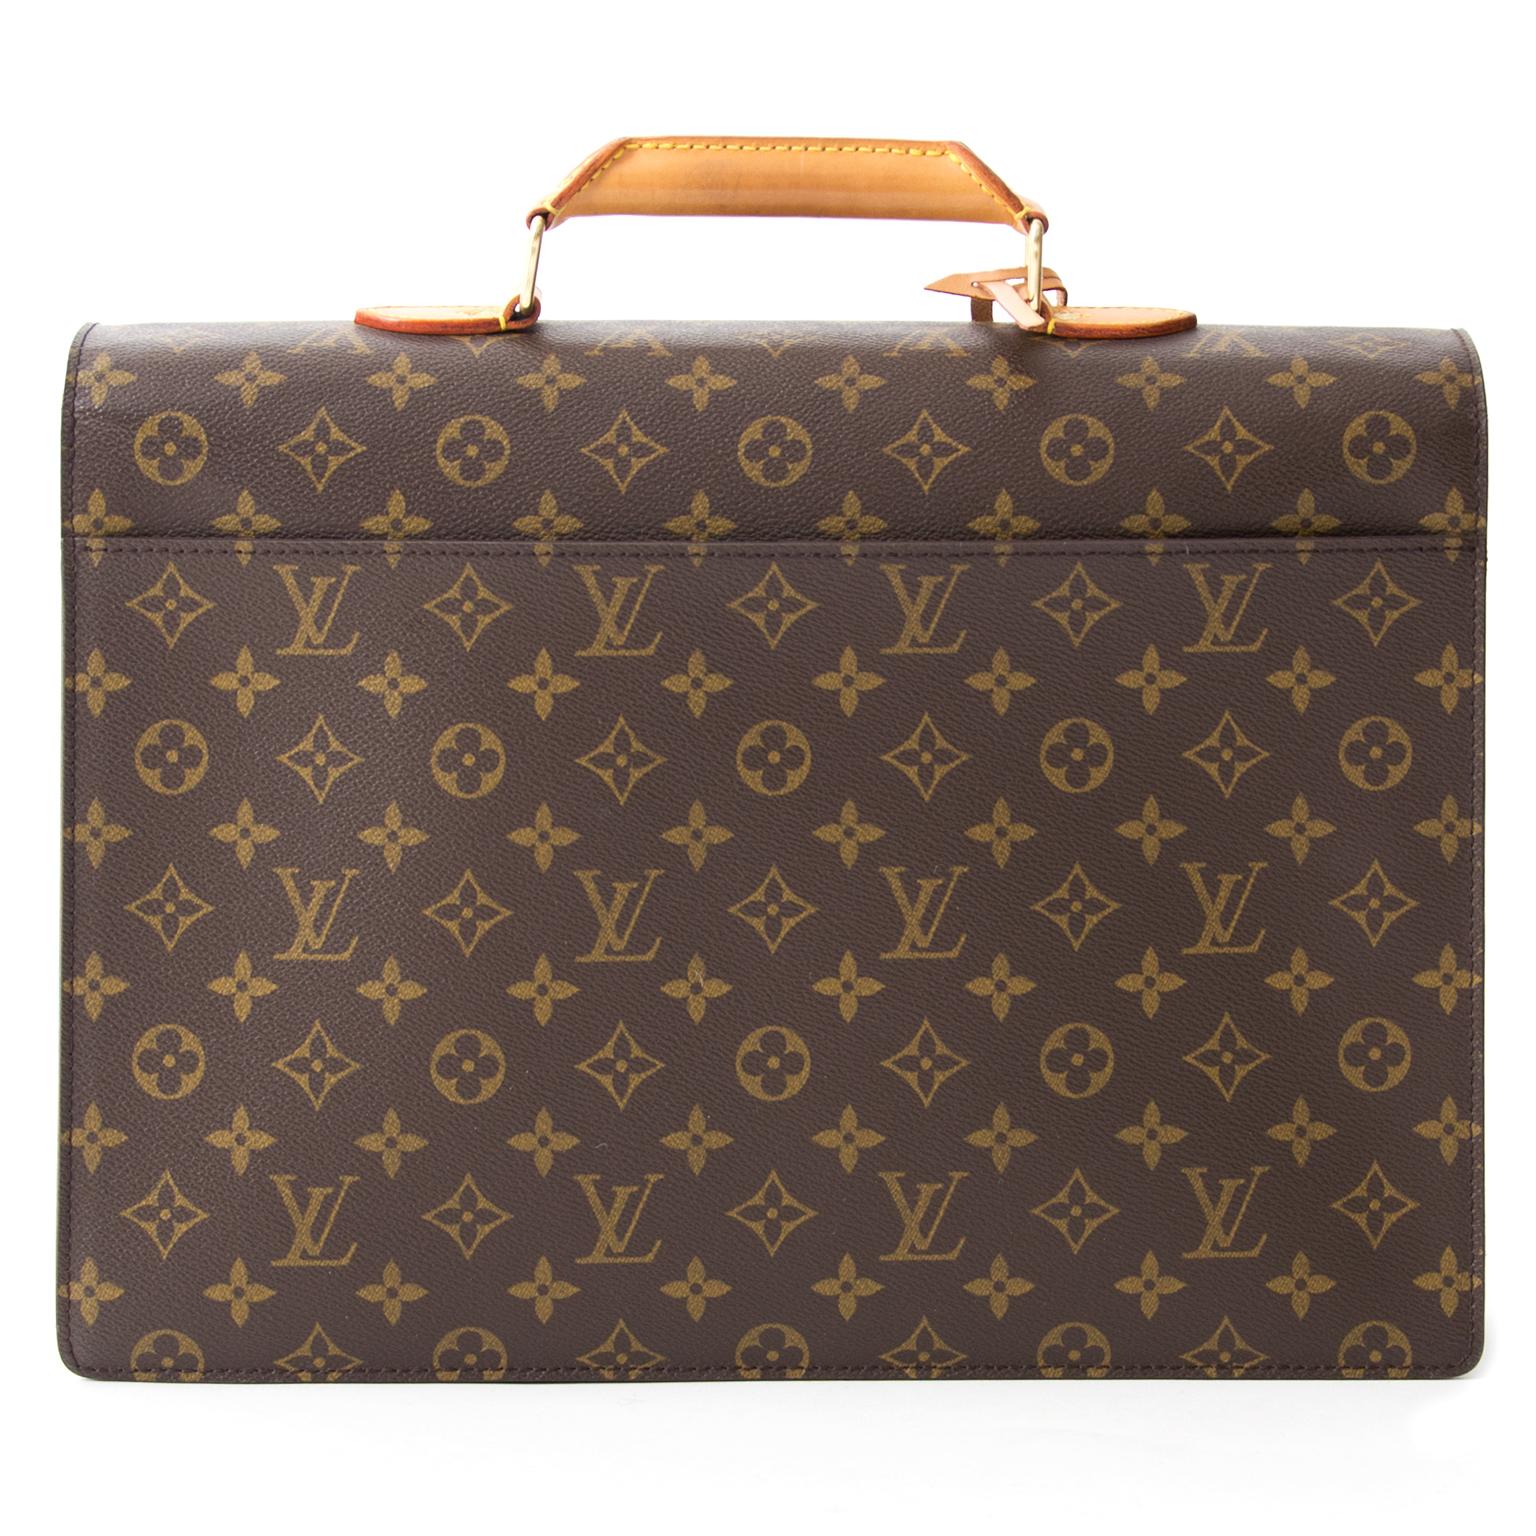 acheter en linge second main sac a main Louis Vuitton Monogram Conseiller Briefcase